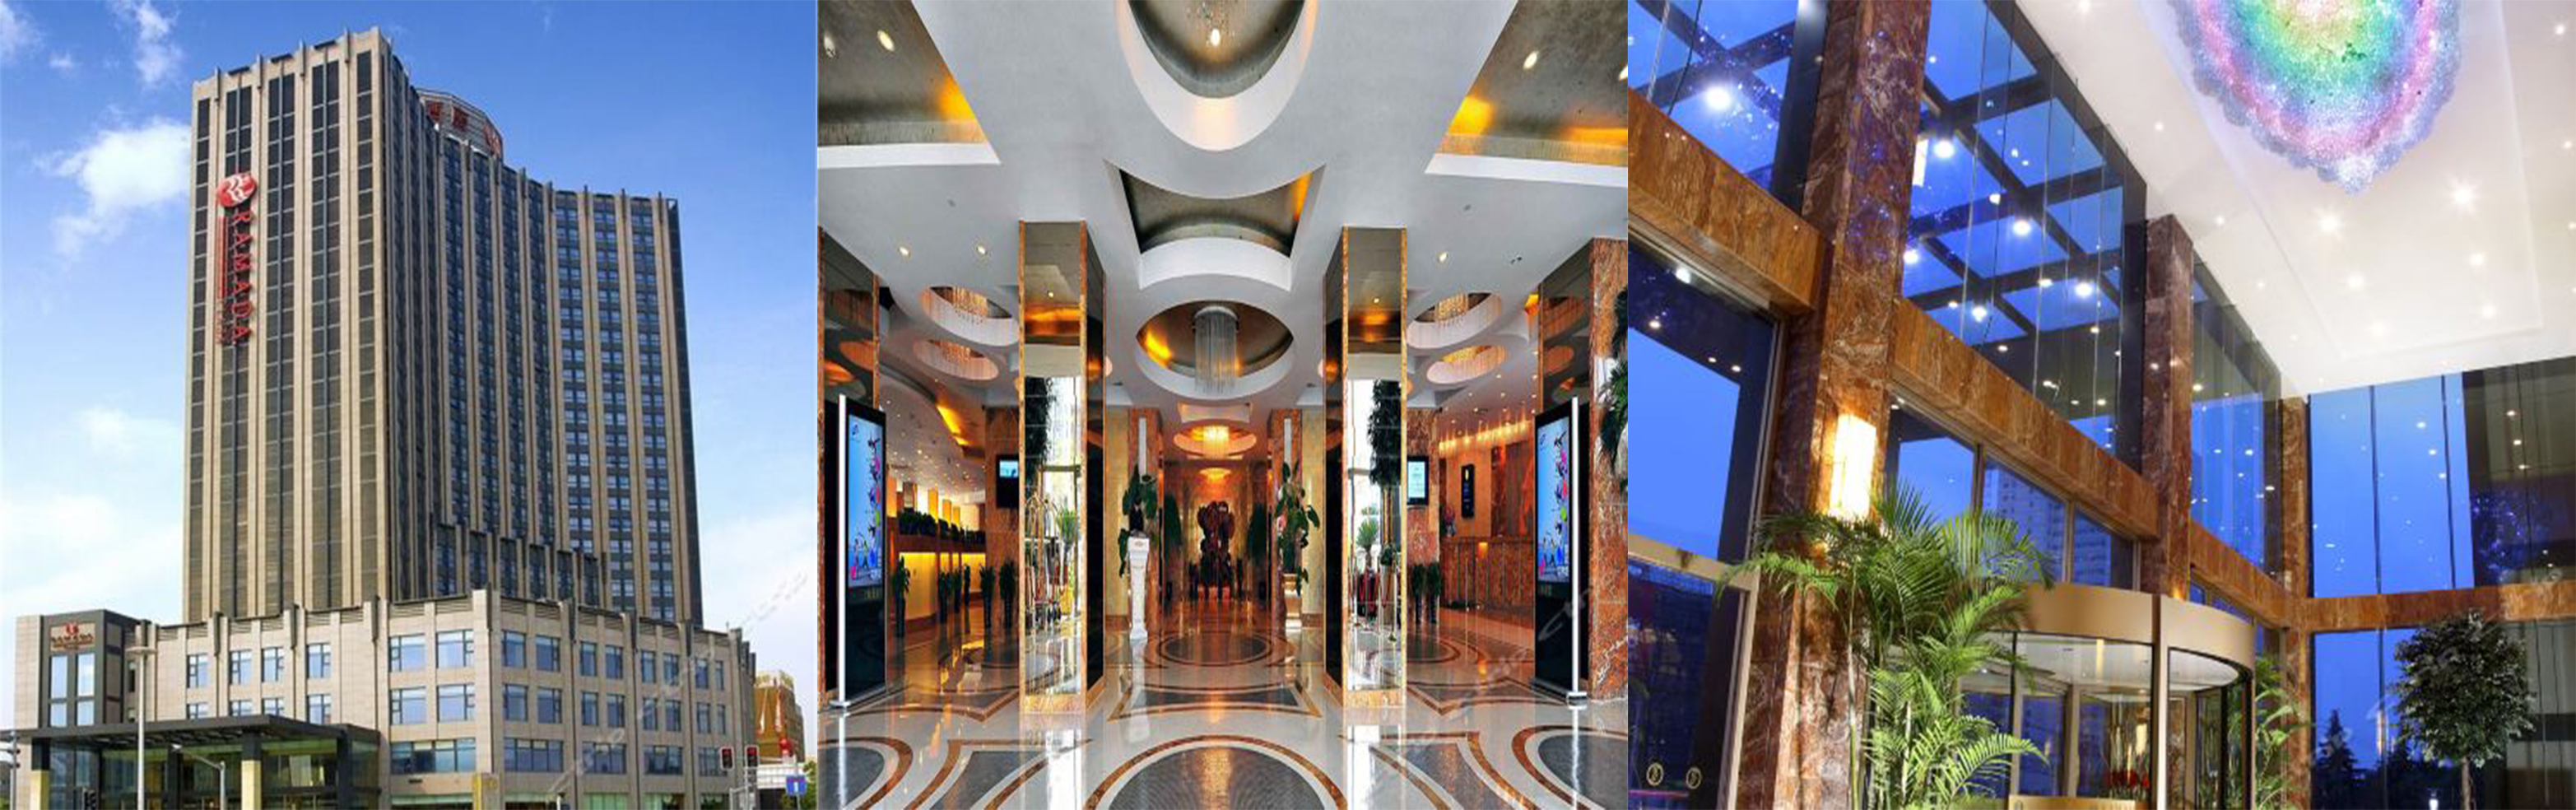 Ramada Plaza Hotel (Pudong South Branch)